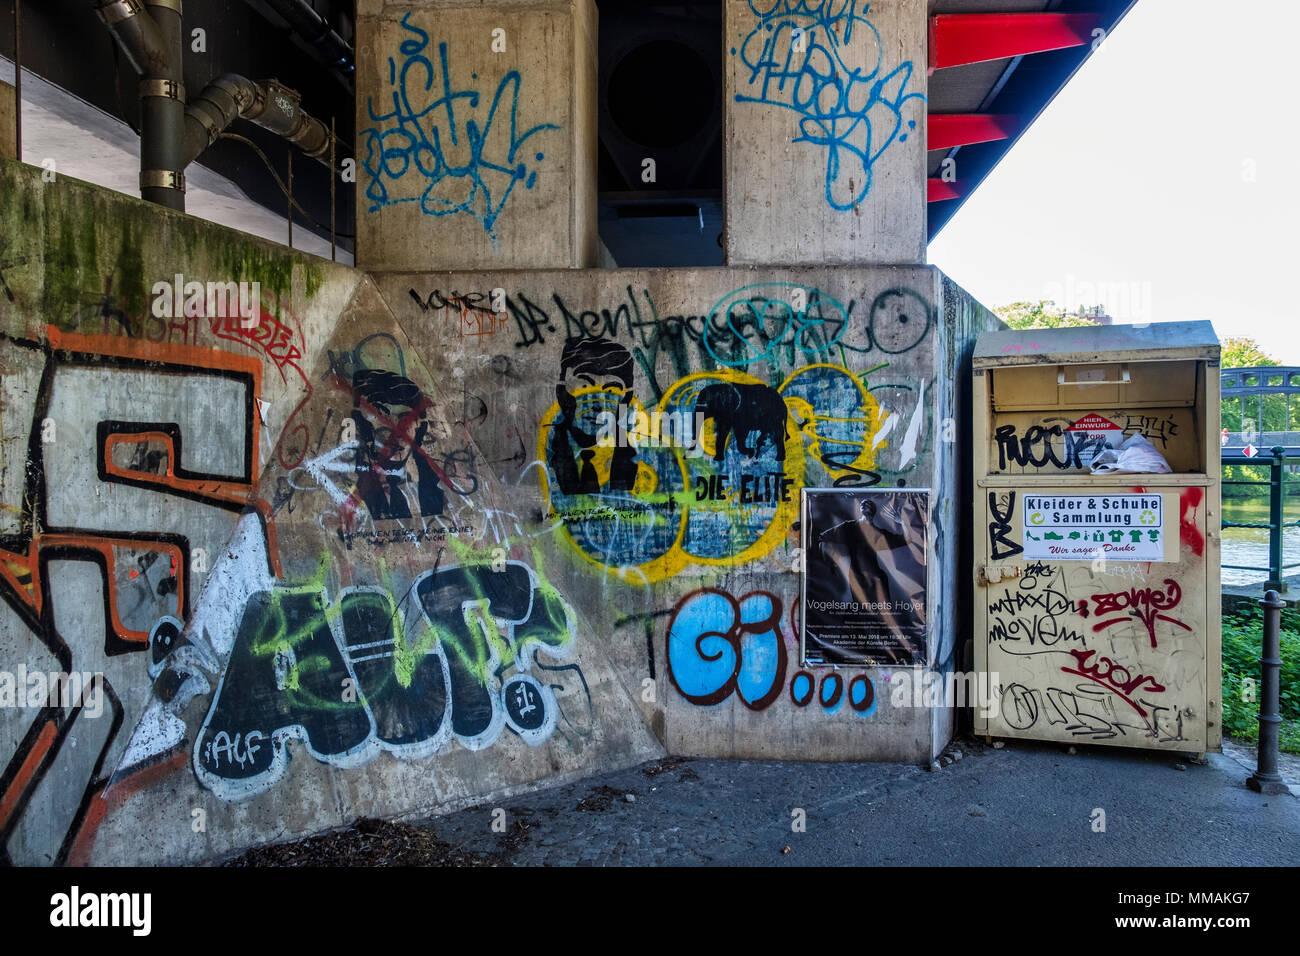 Berlin Mitte. Street art and graffiti under S-bahn railway bridge across Spree River. - Stock Image